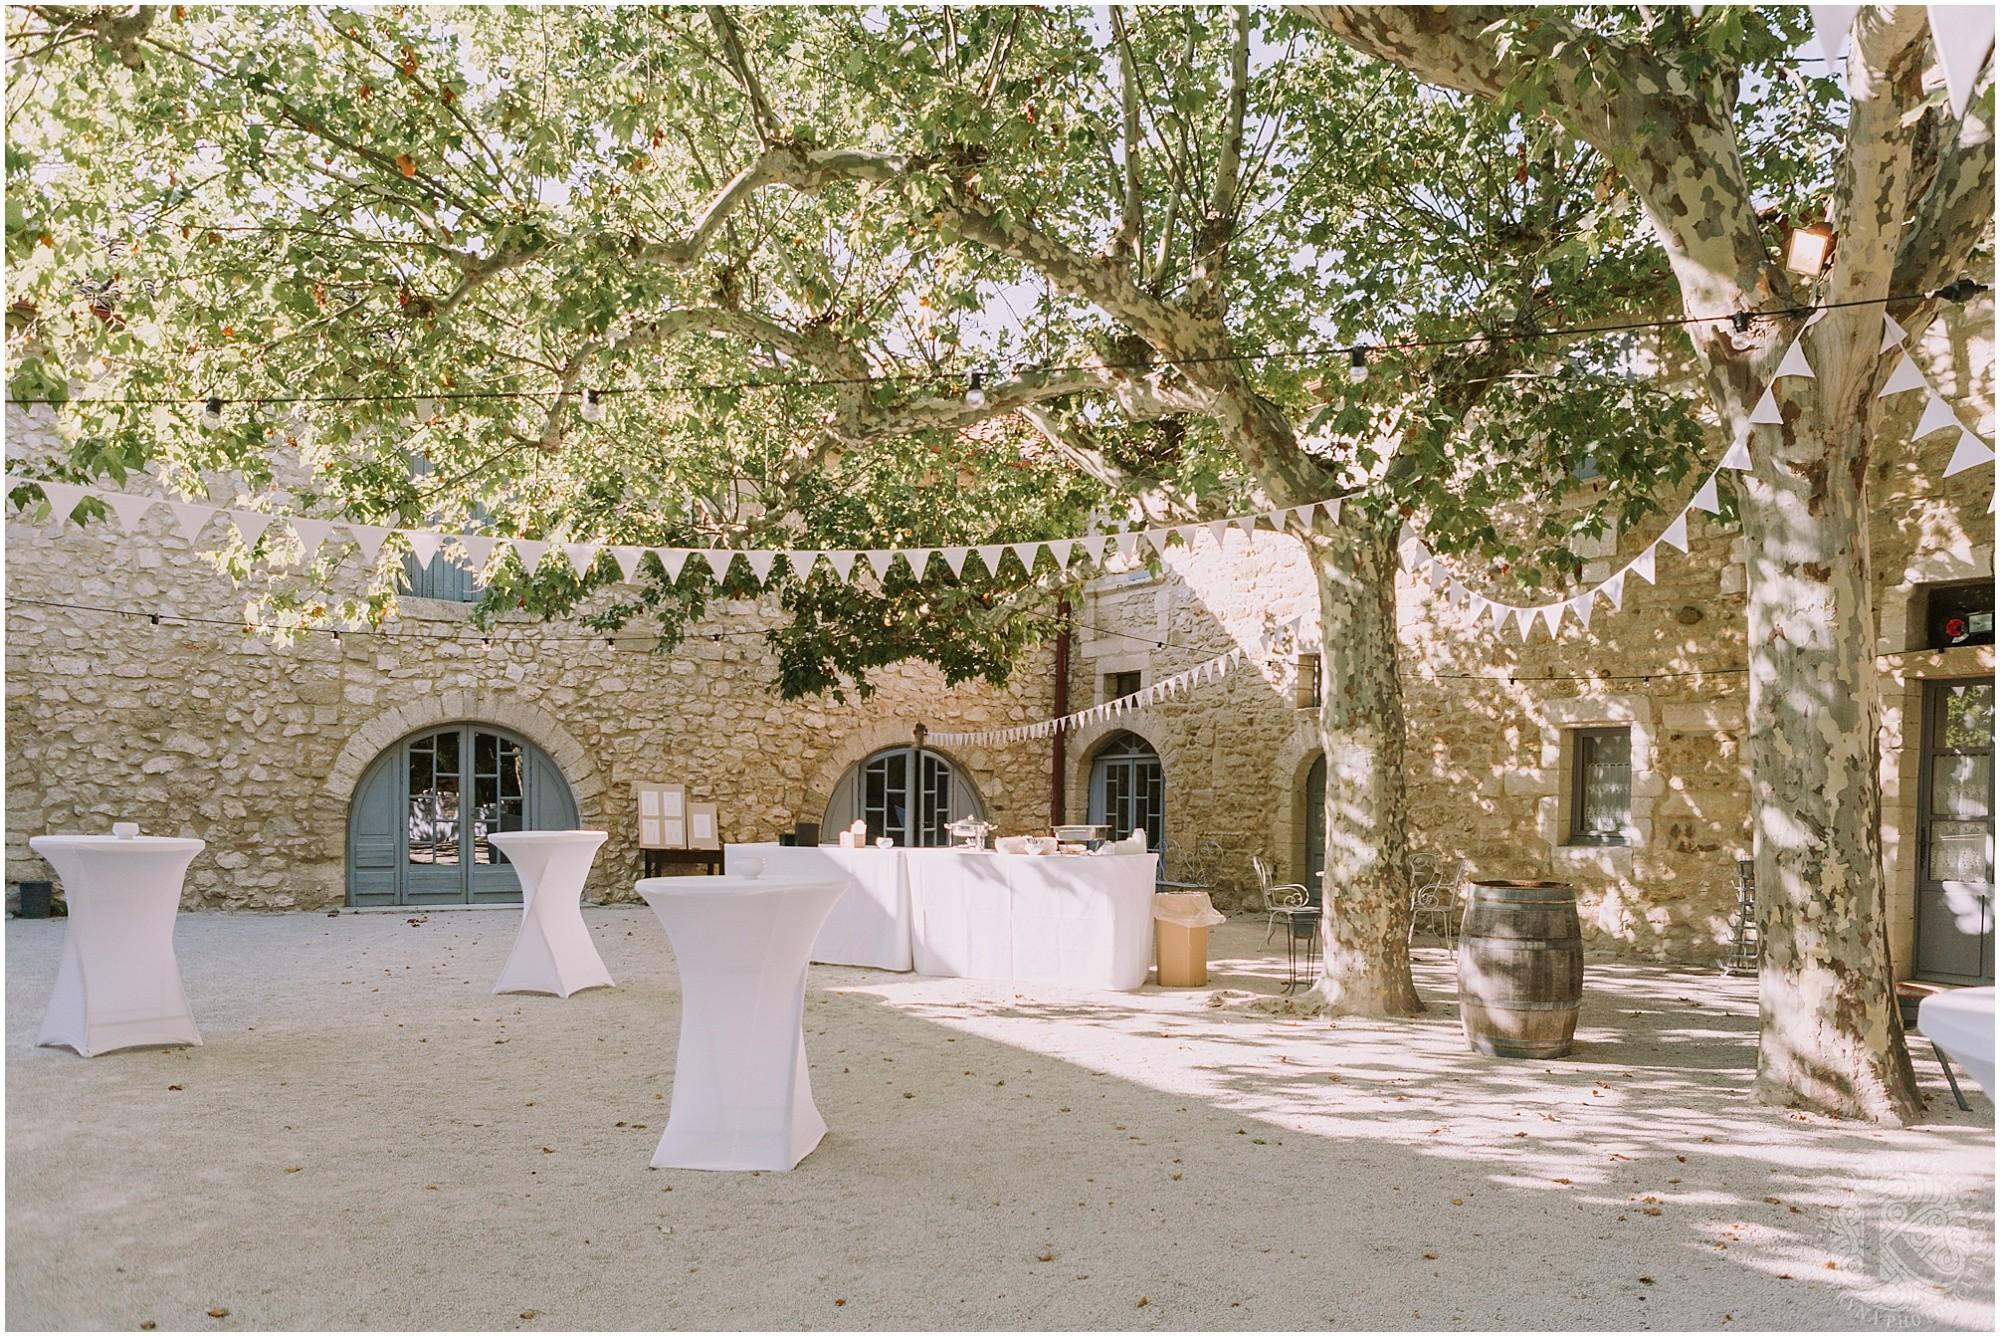 Kateryna-photos-photographe-mariage-vaucluse-provence-avignon-ferme-st-hugues_0056.jpg